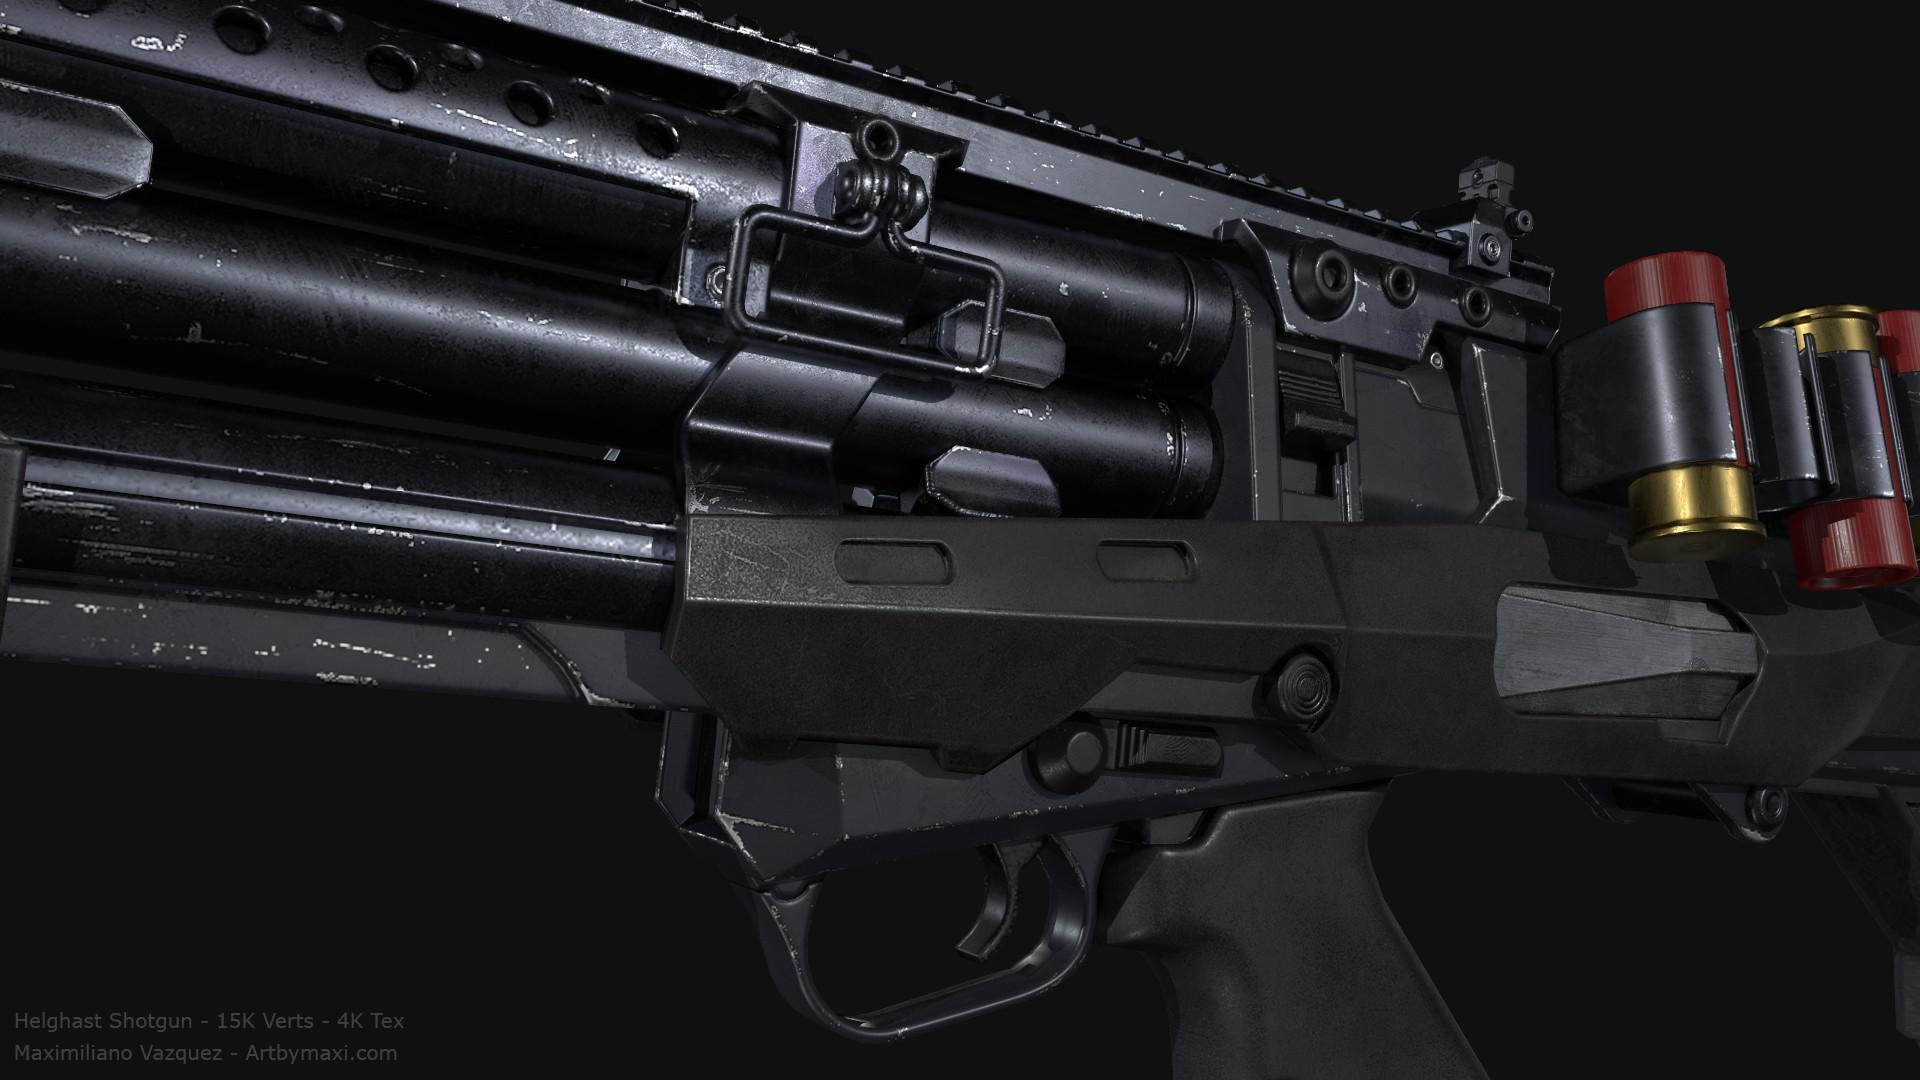 Maximiliano vazquez hellghast shotgun lp11